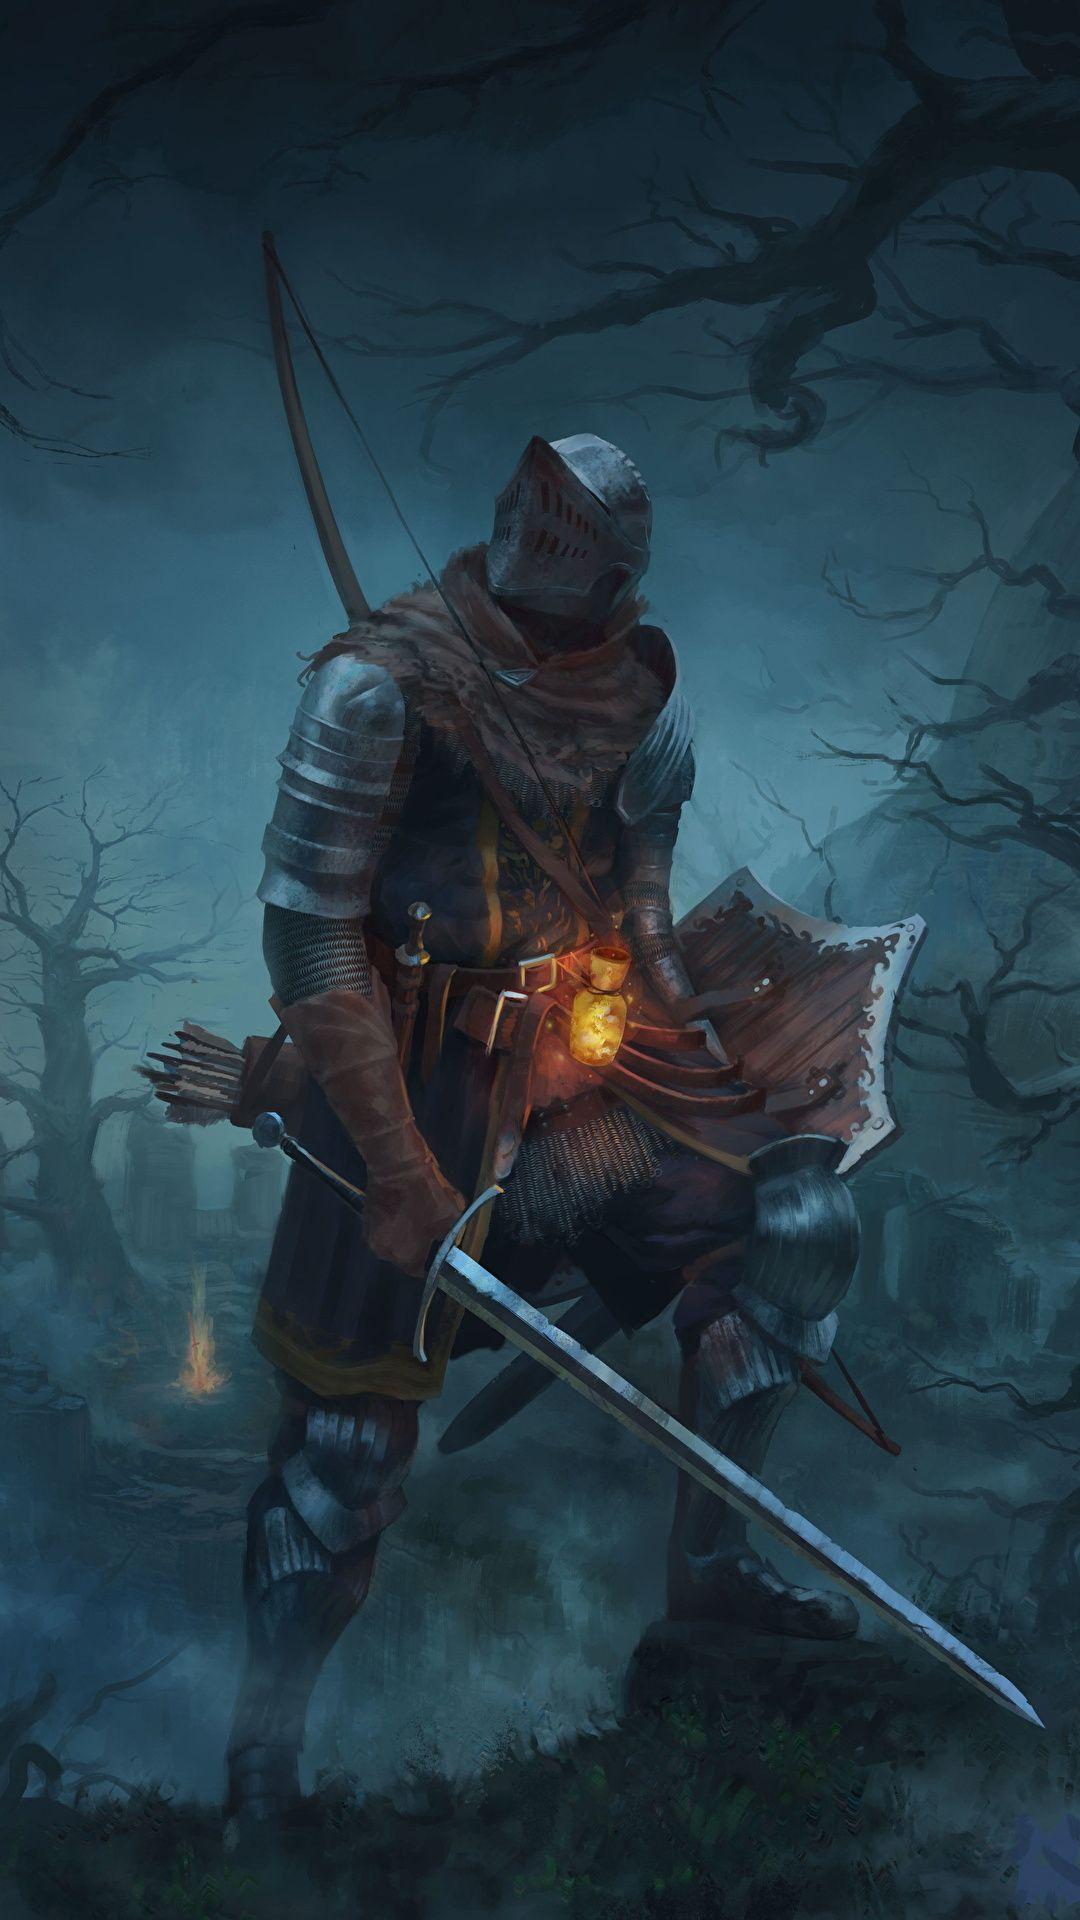 Knight Dark Souls Armor Swords Shield Fantasy Photo Fantasy, Armor